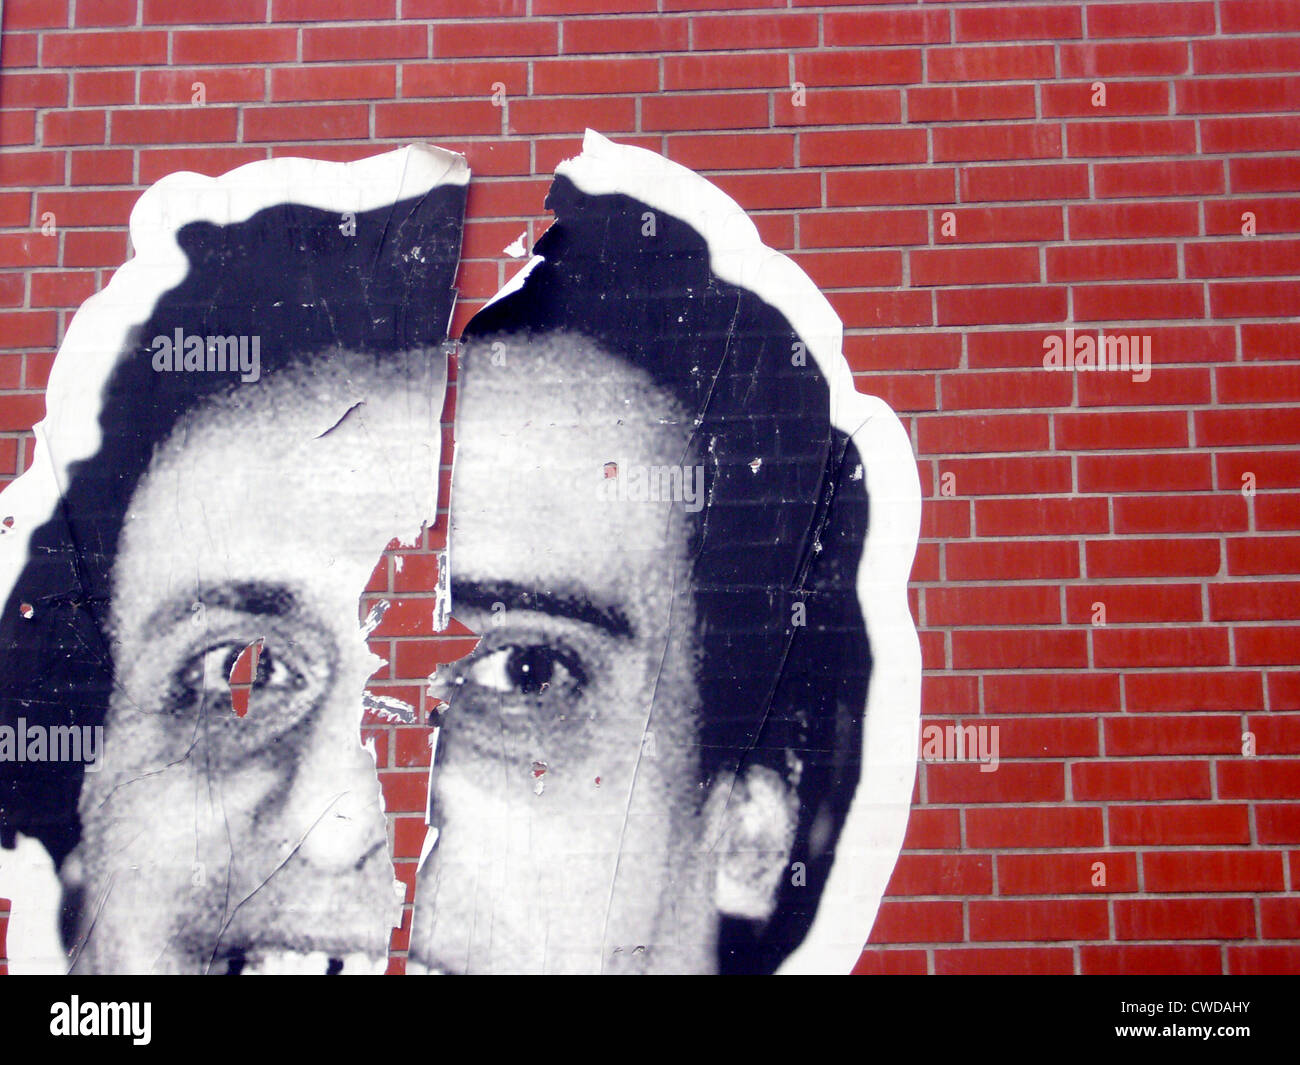 Strappata,poster,streetart Immagini Stock